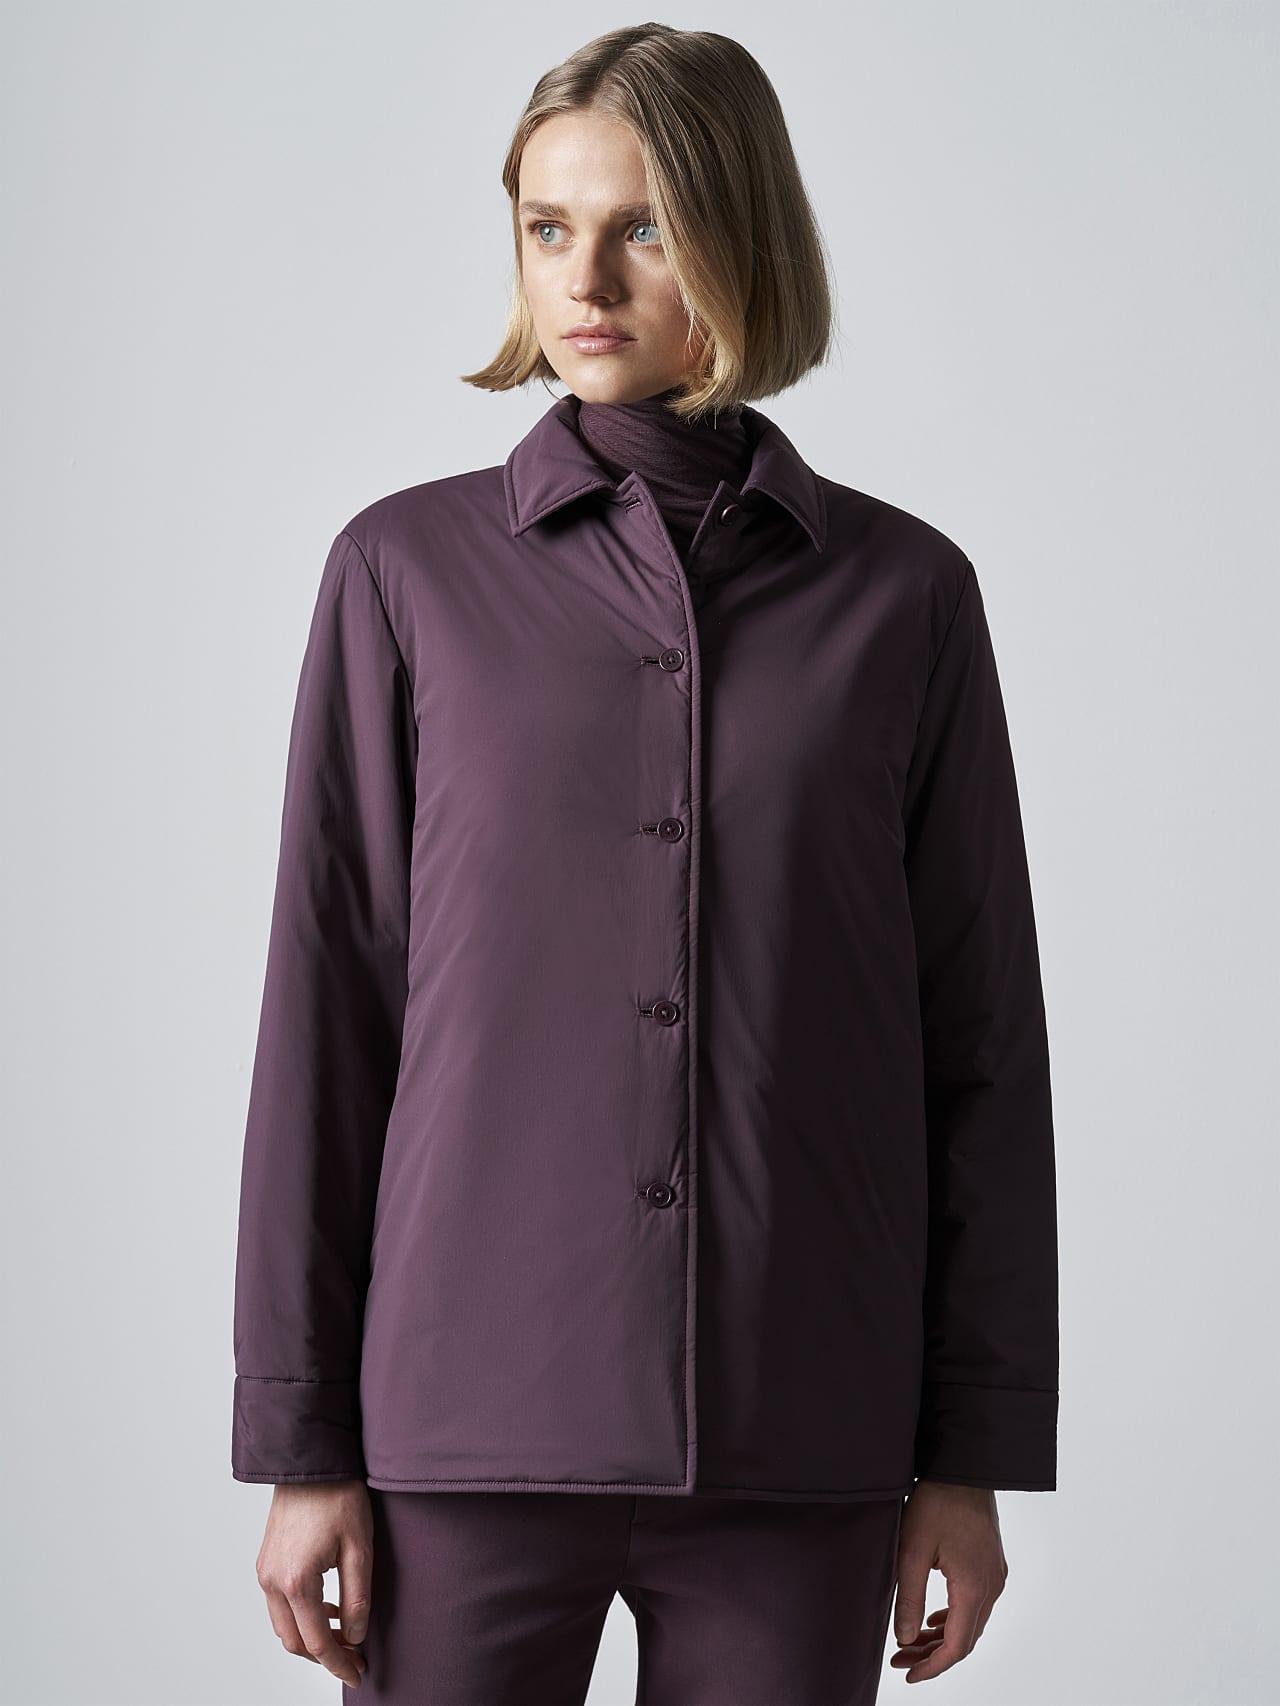 OSHEN V1.Y5.02 PrimaLoft® Overshirt Jacket Burgundy Extra Alpha Tauri